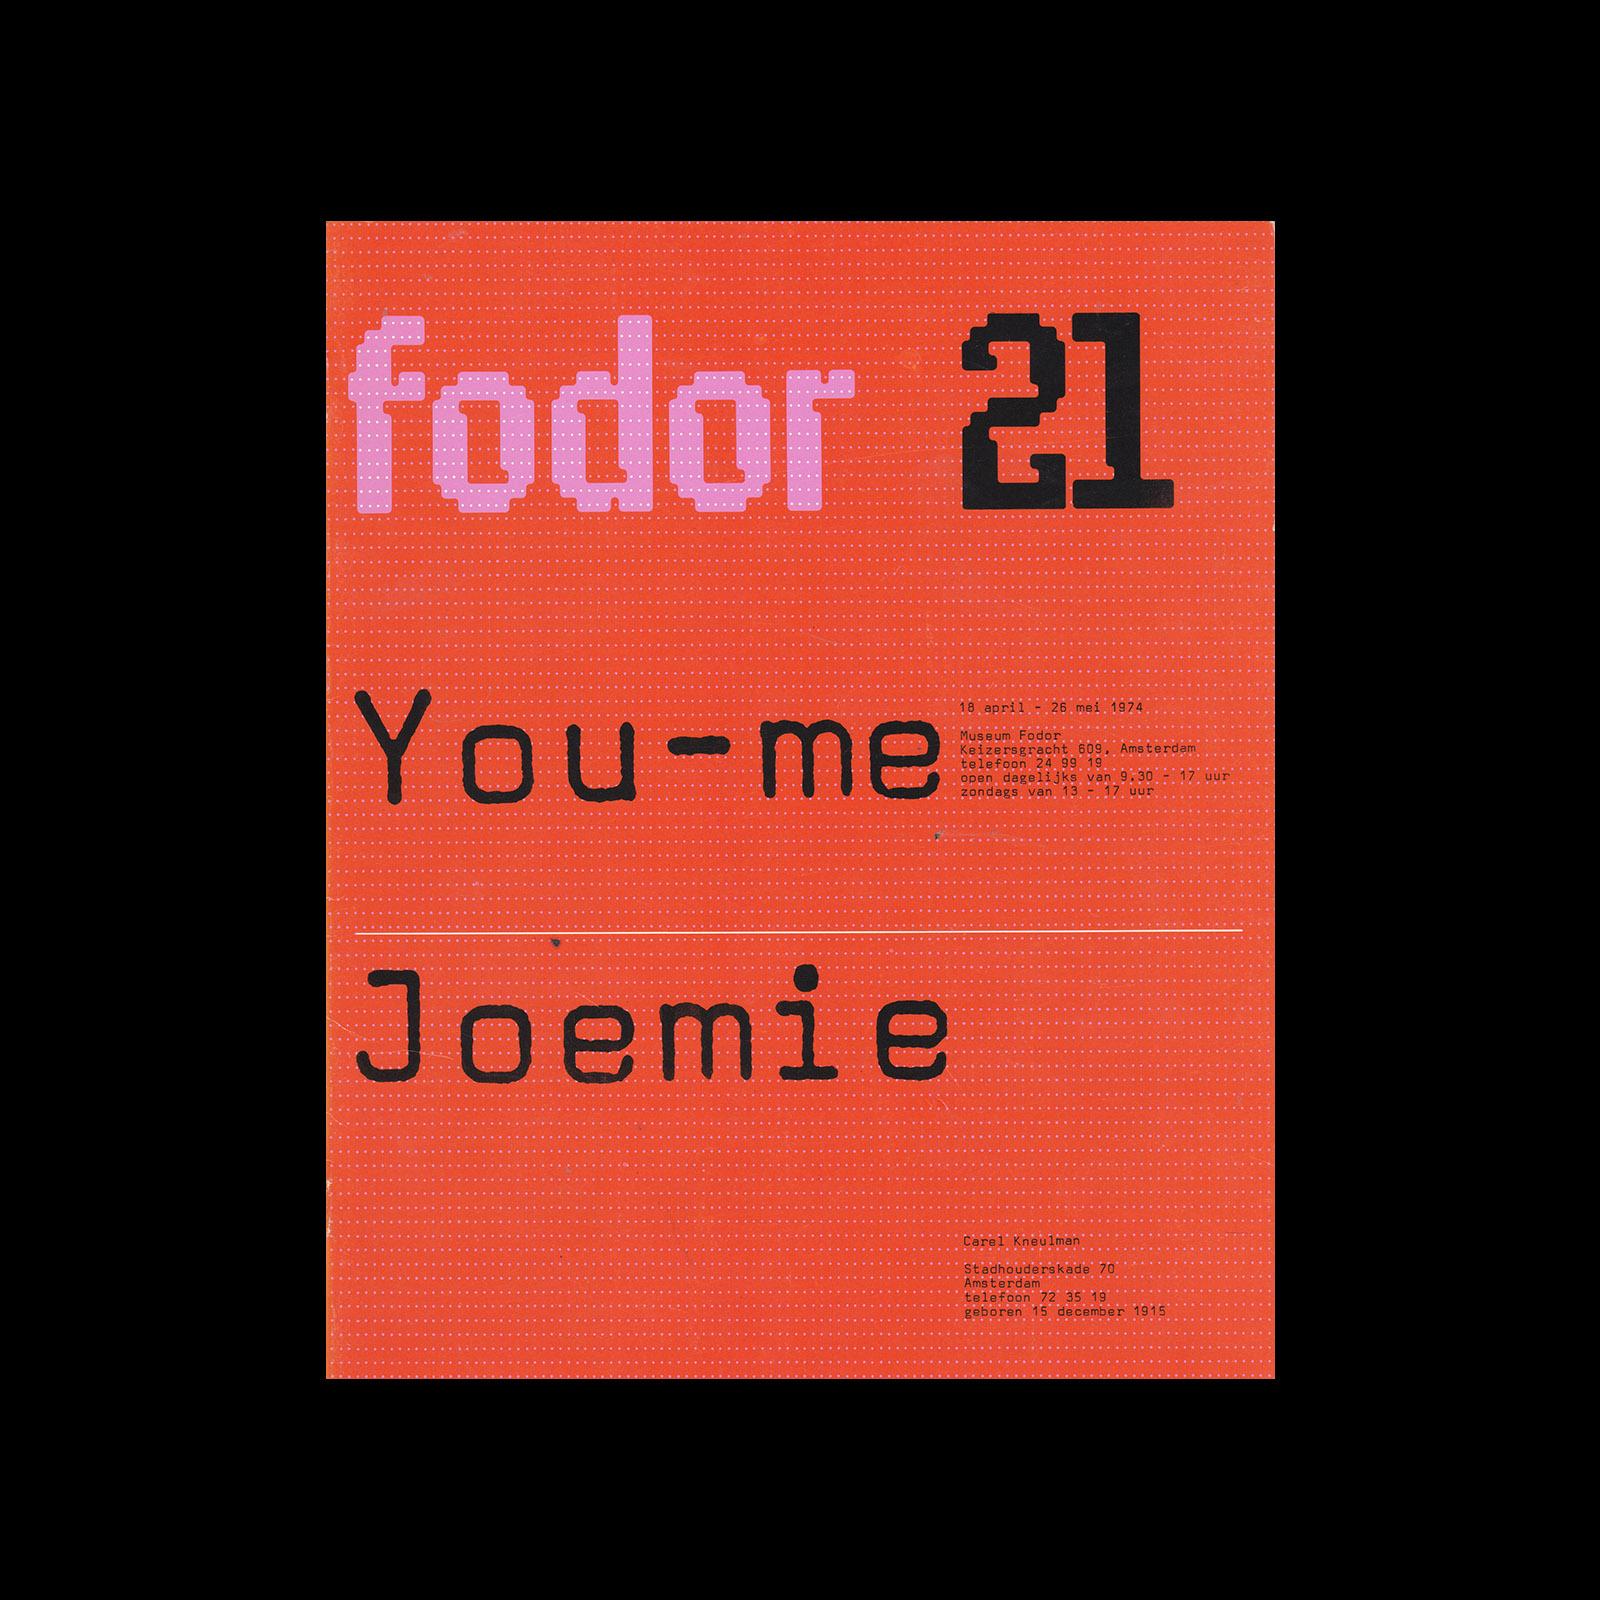 Fodor 21, 1974 - You-me, Joemie. Designed by Wim Crouwel and Daphne Duijvelshoff (Total Design)